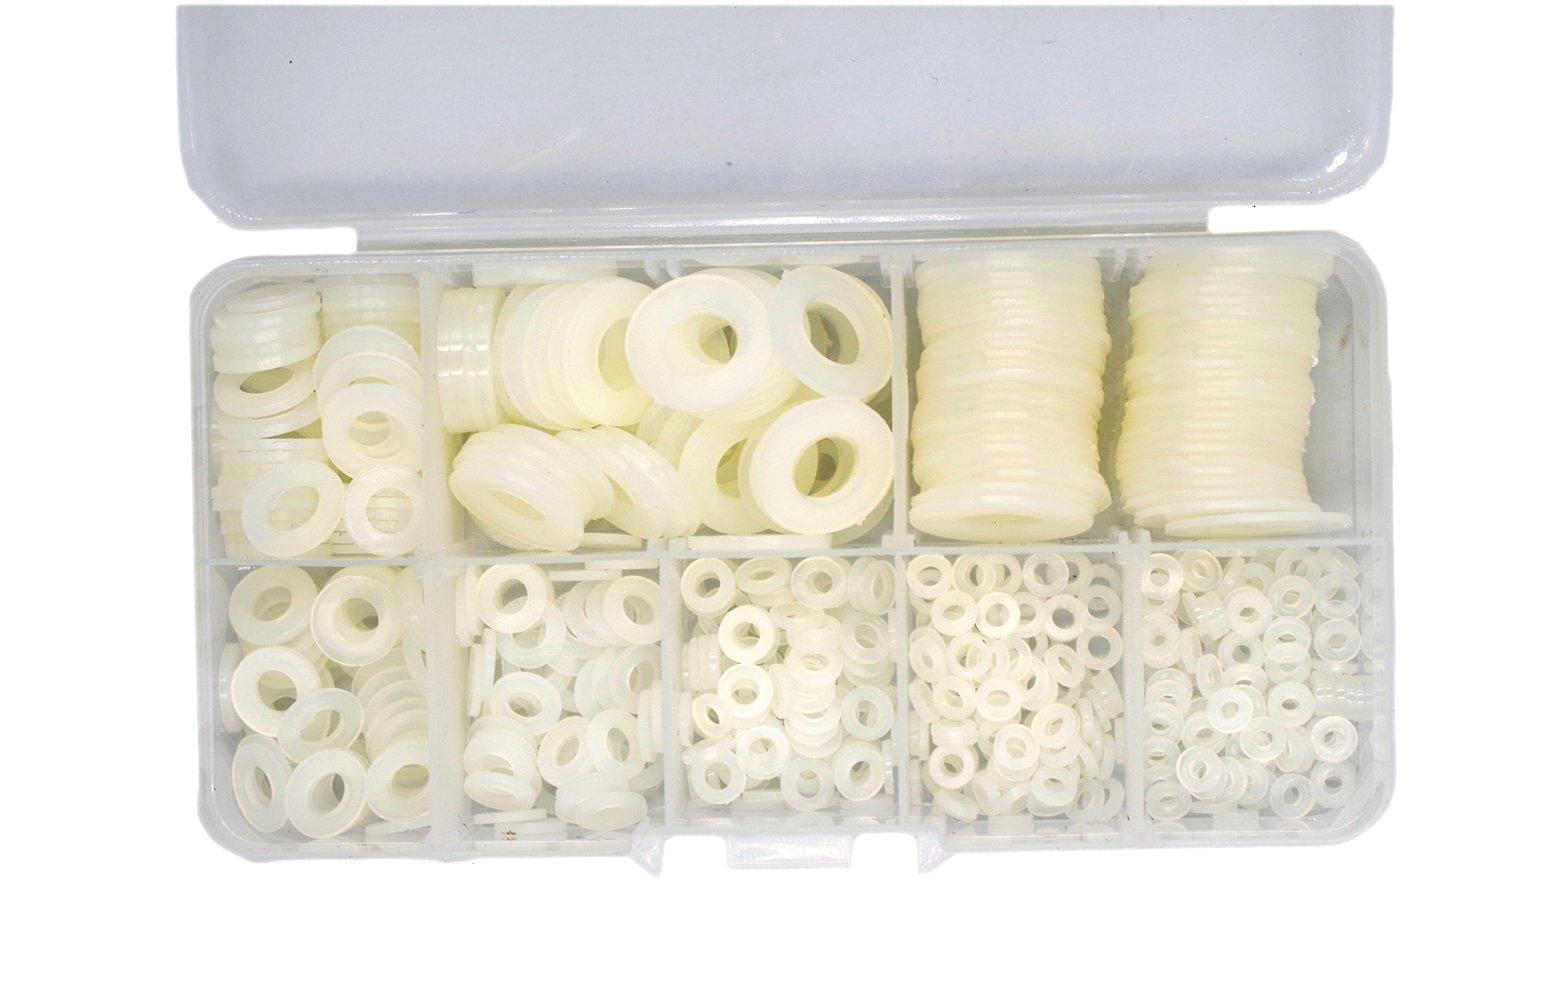 HVAZI 550PCS Nylon Flat Washer Assortment Kit For M2 M2.5 M3 M4 M5 M6 M8 M10 Screw/Bolt(white)